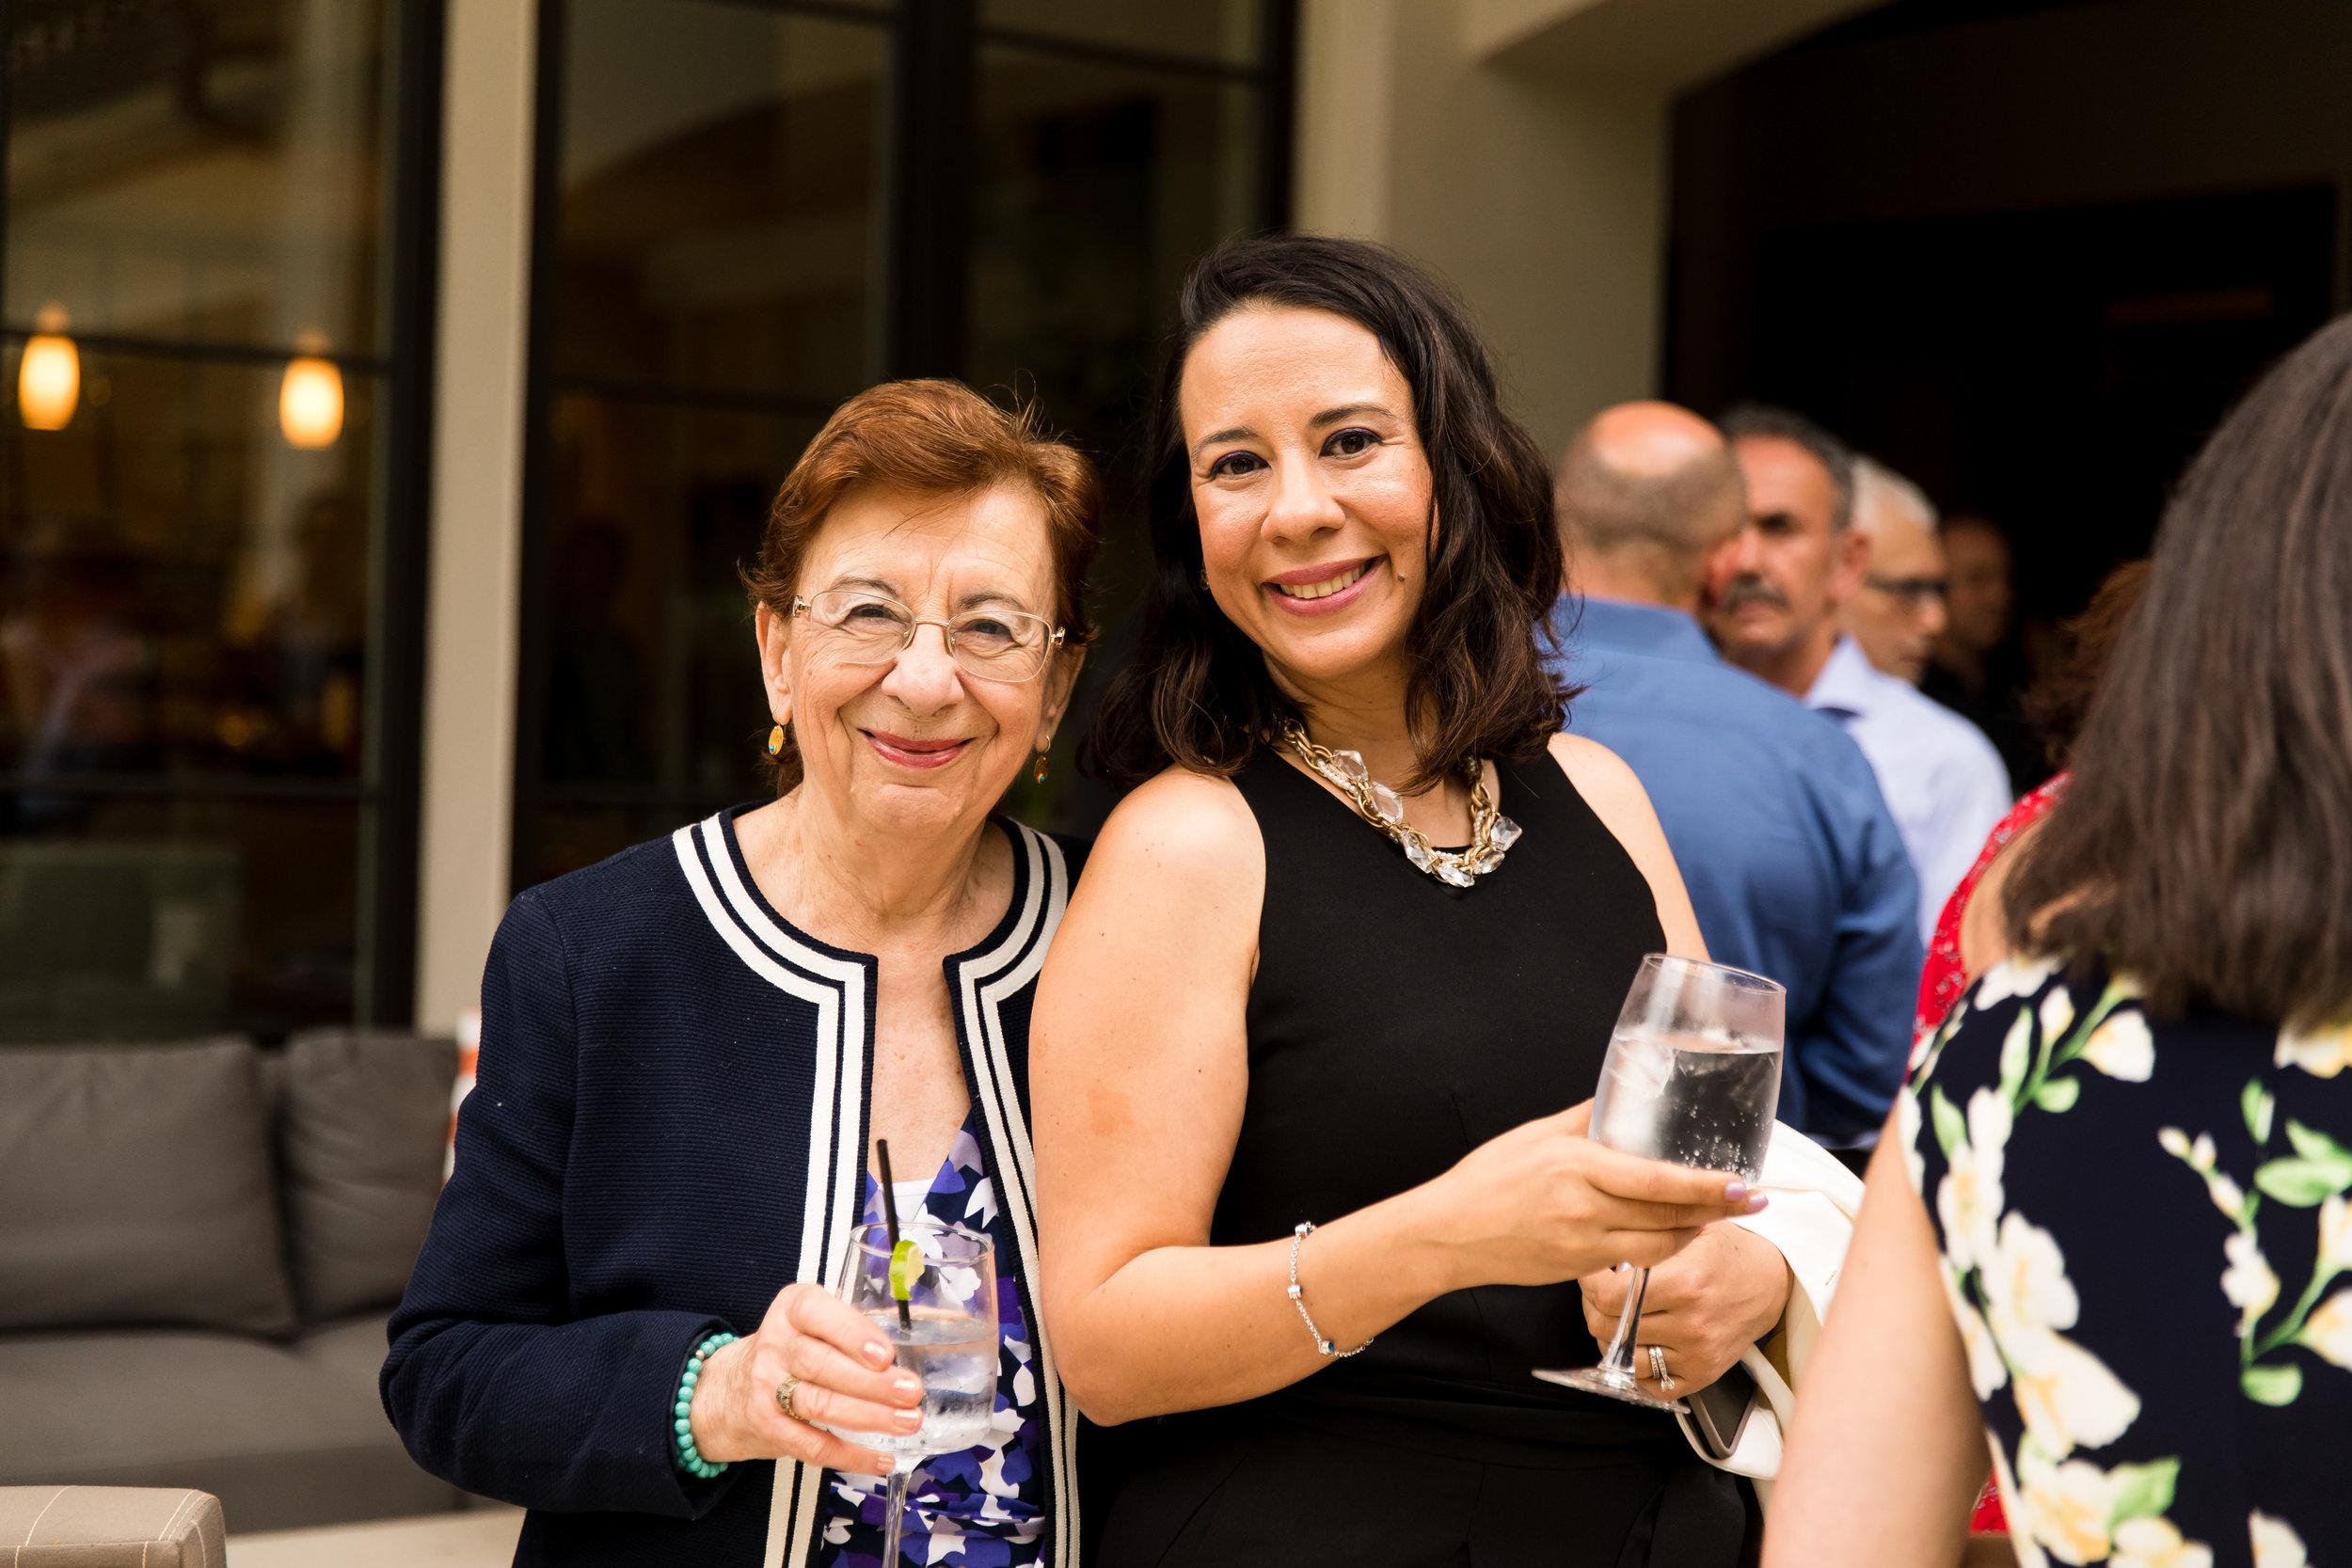 20180421-3rd Annual Education Women Turkey-212.jpg